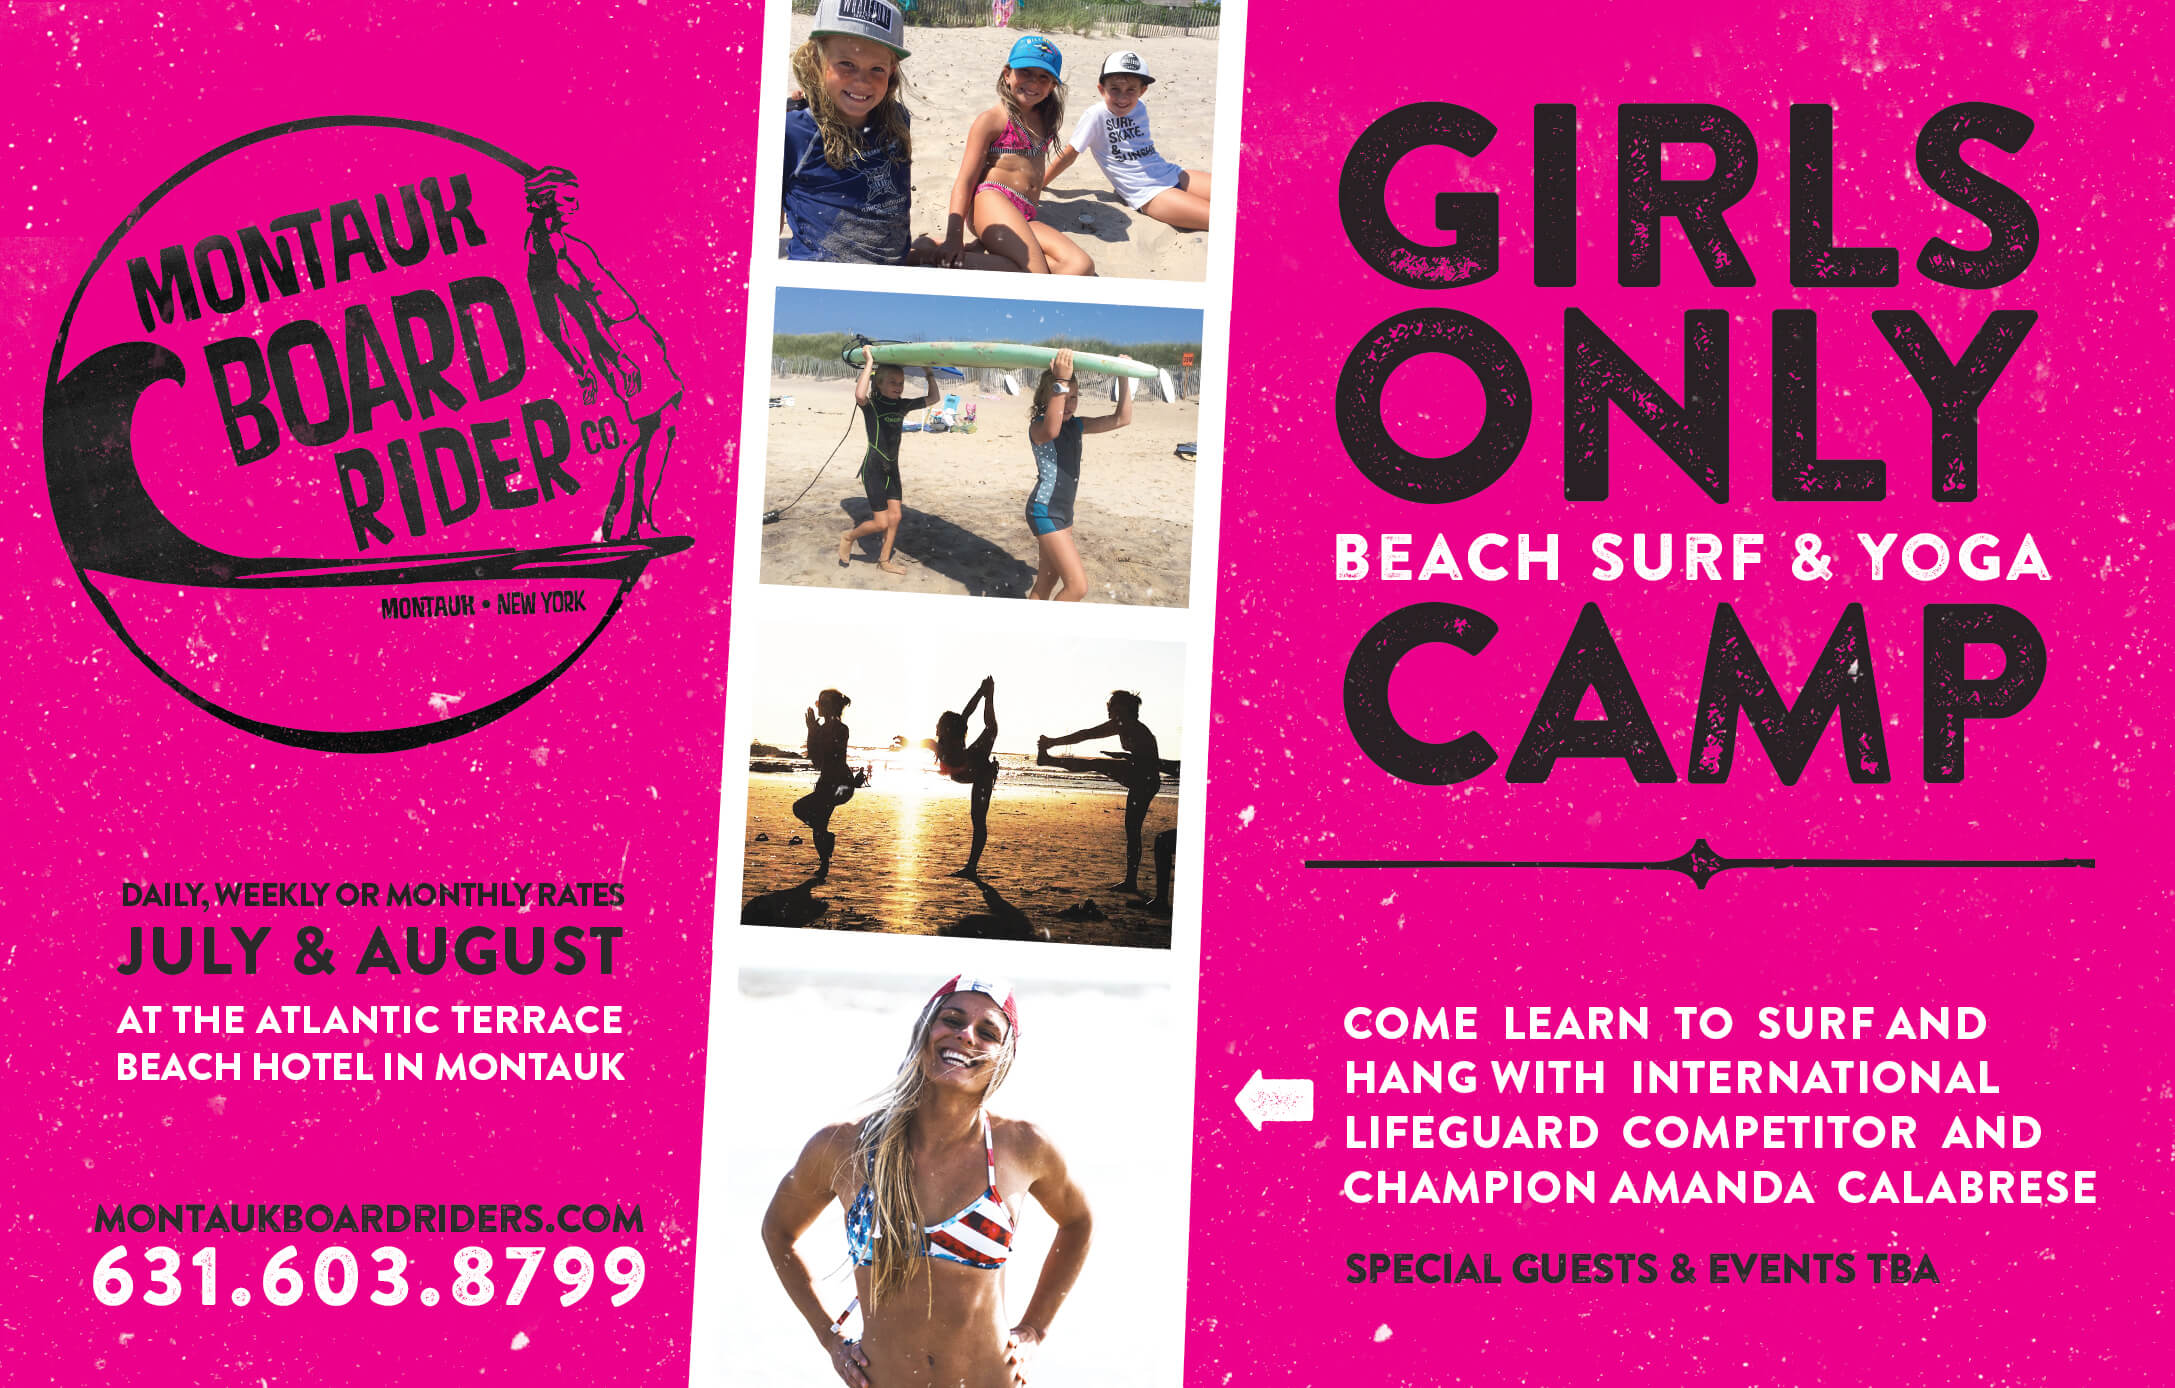 Montauk Boardriders girls only camp